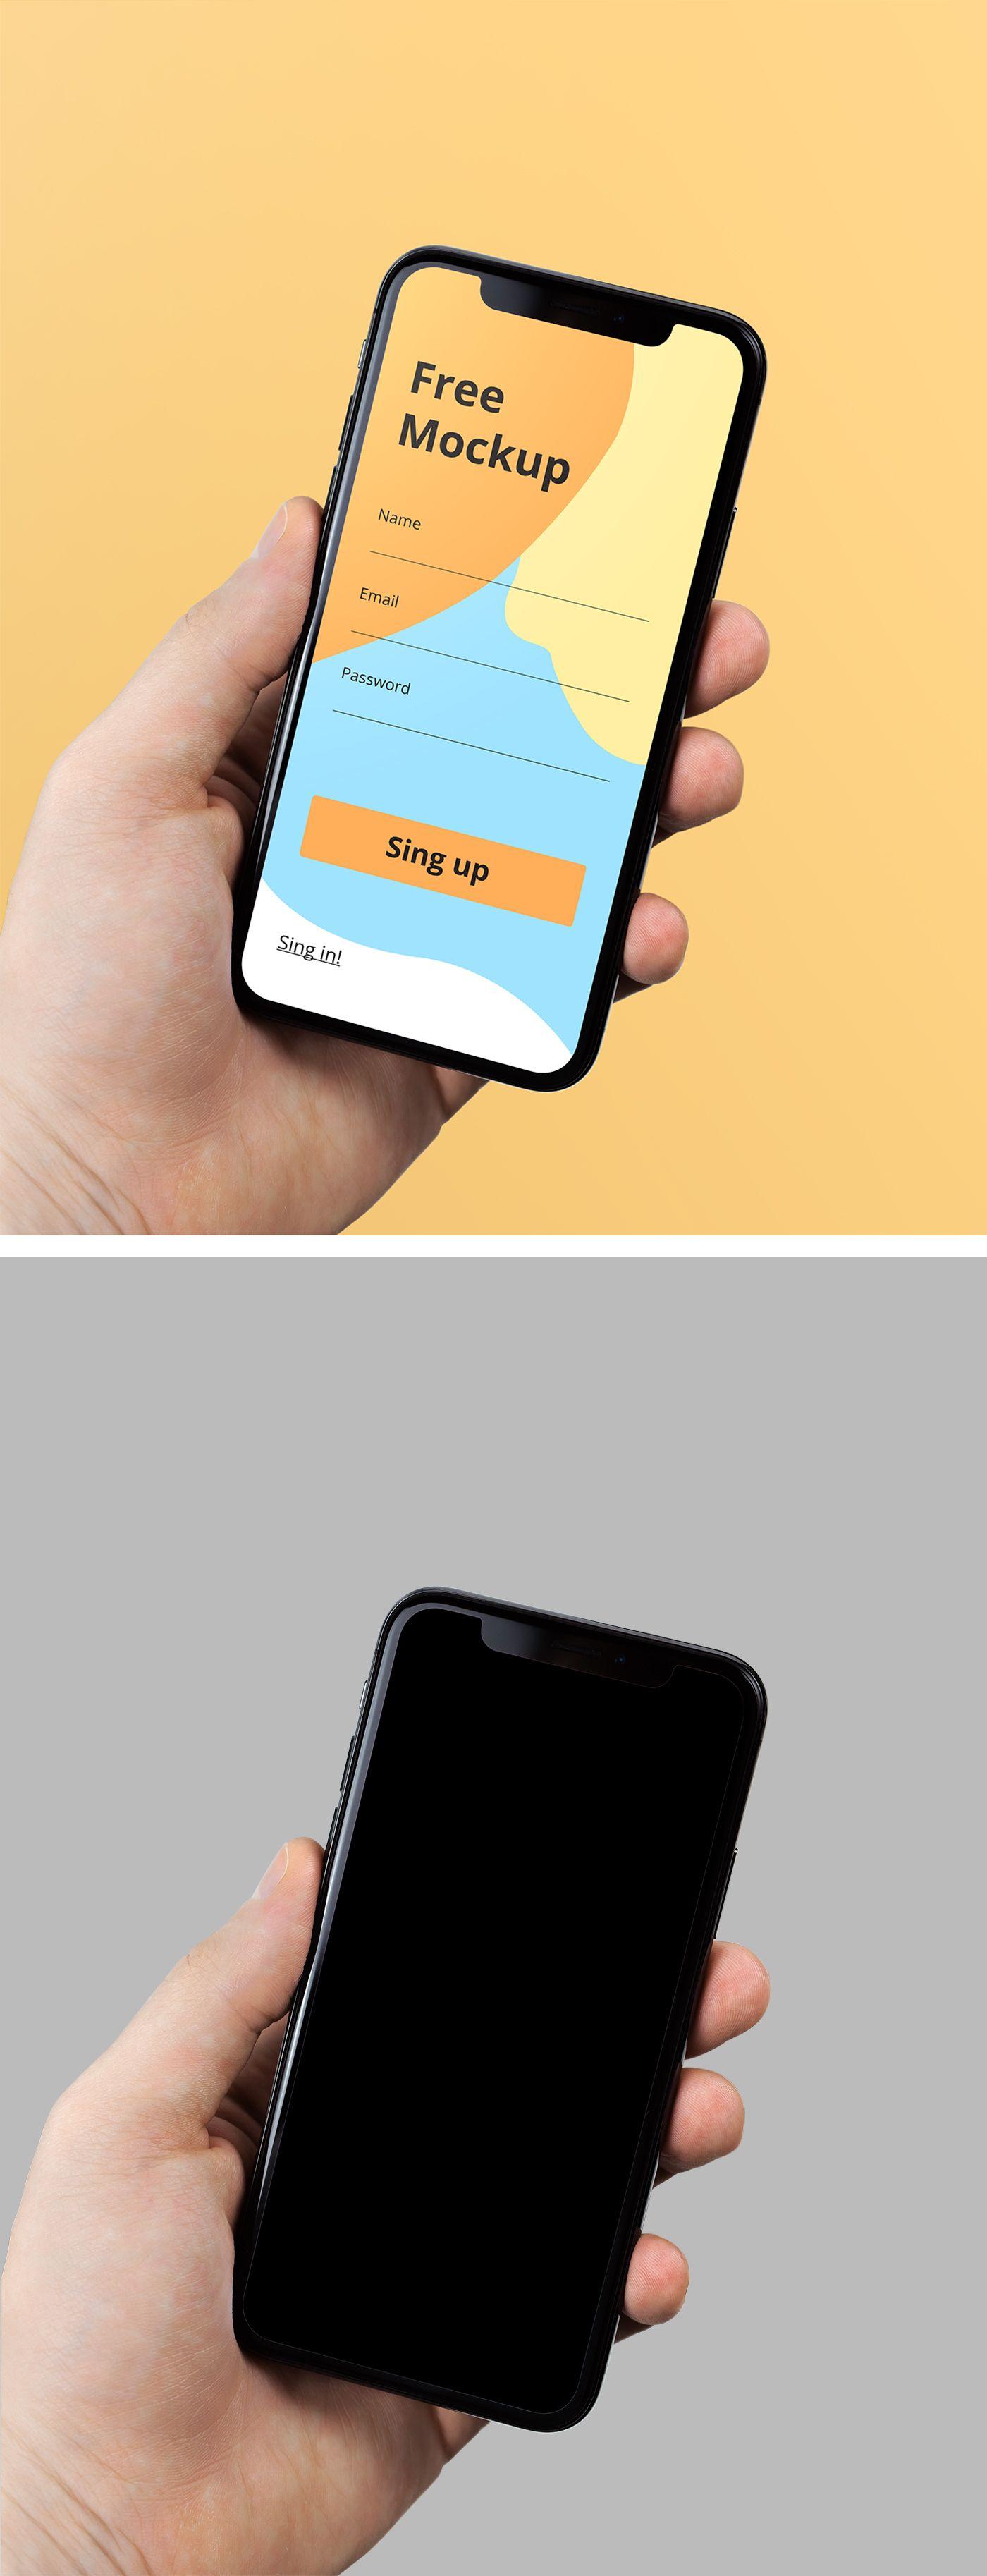 Download Iphone X In Hand Mockup Mr Mockup Graphic Design Freebies Graphic Design Freebies Design Freebie Iphone Mockup Free